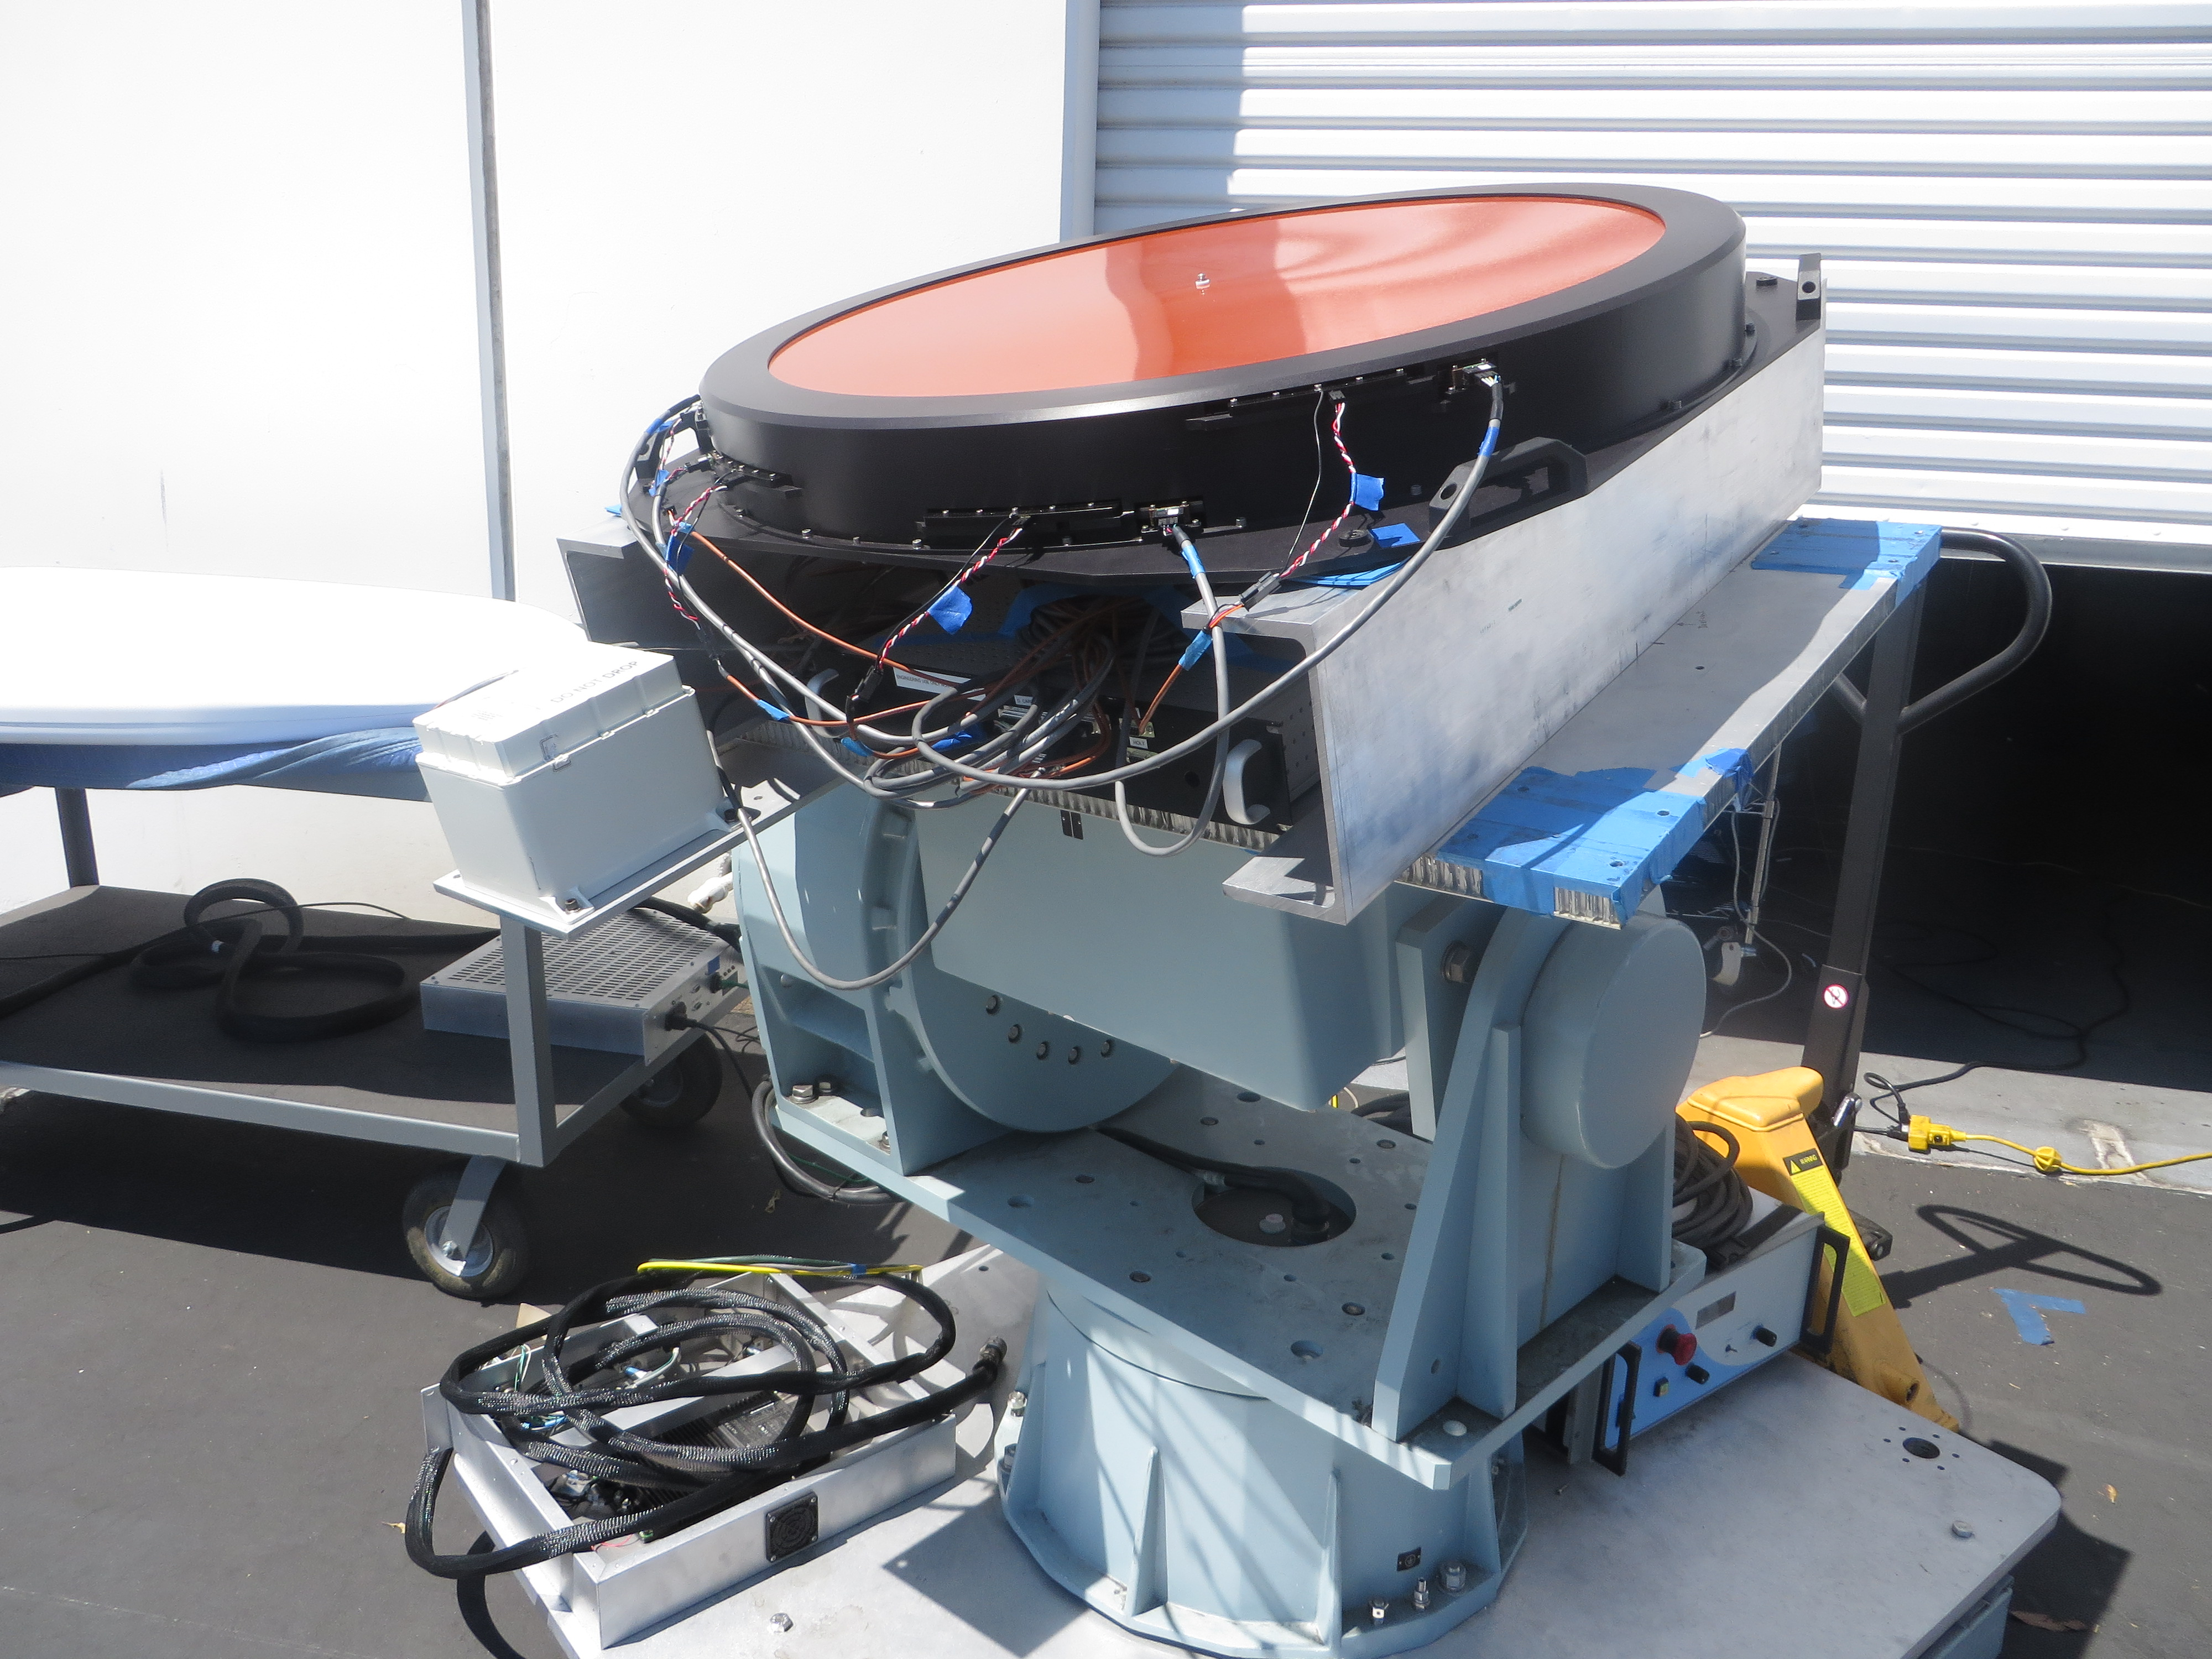 Gogo's new mechanically steered satellite antenna rig